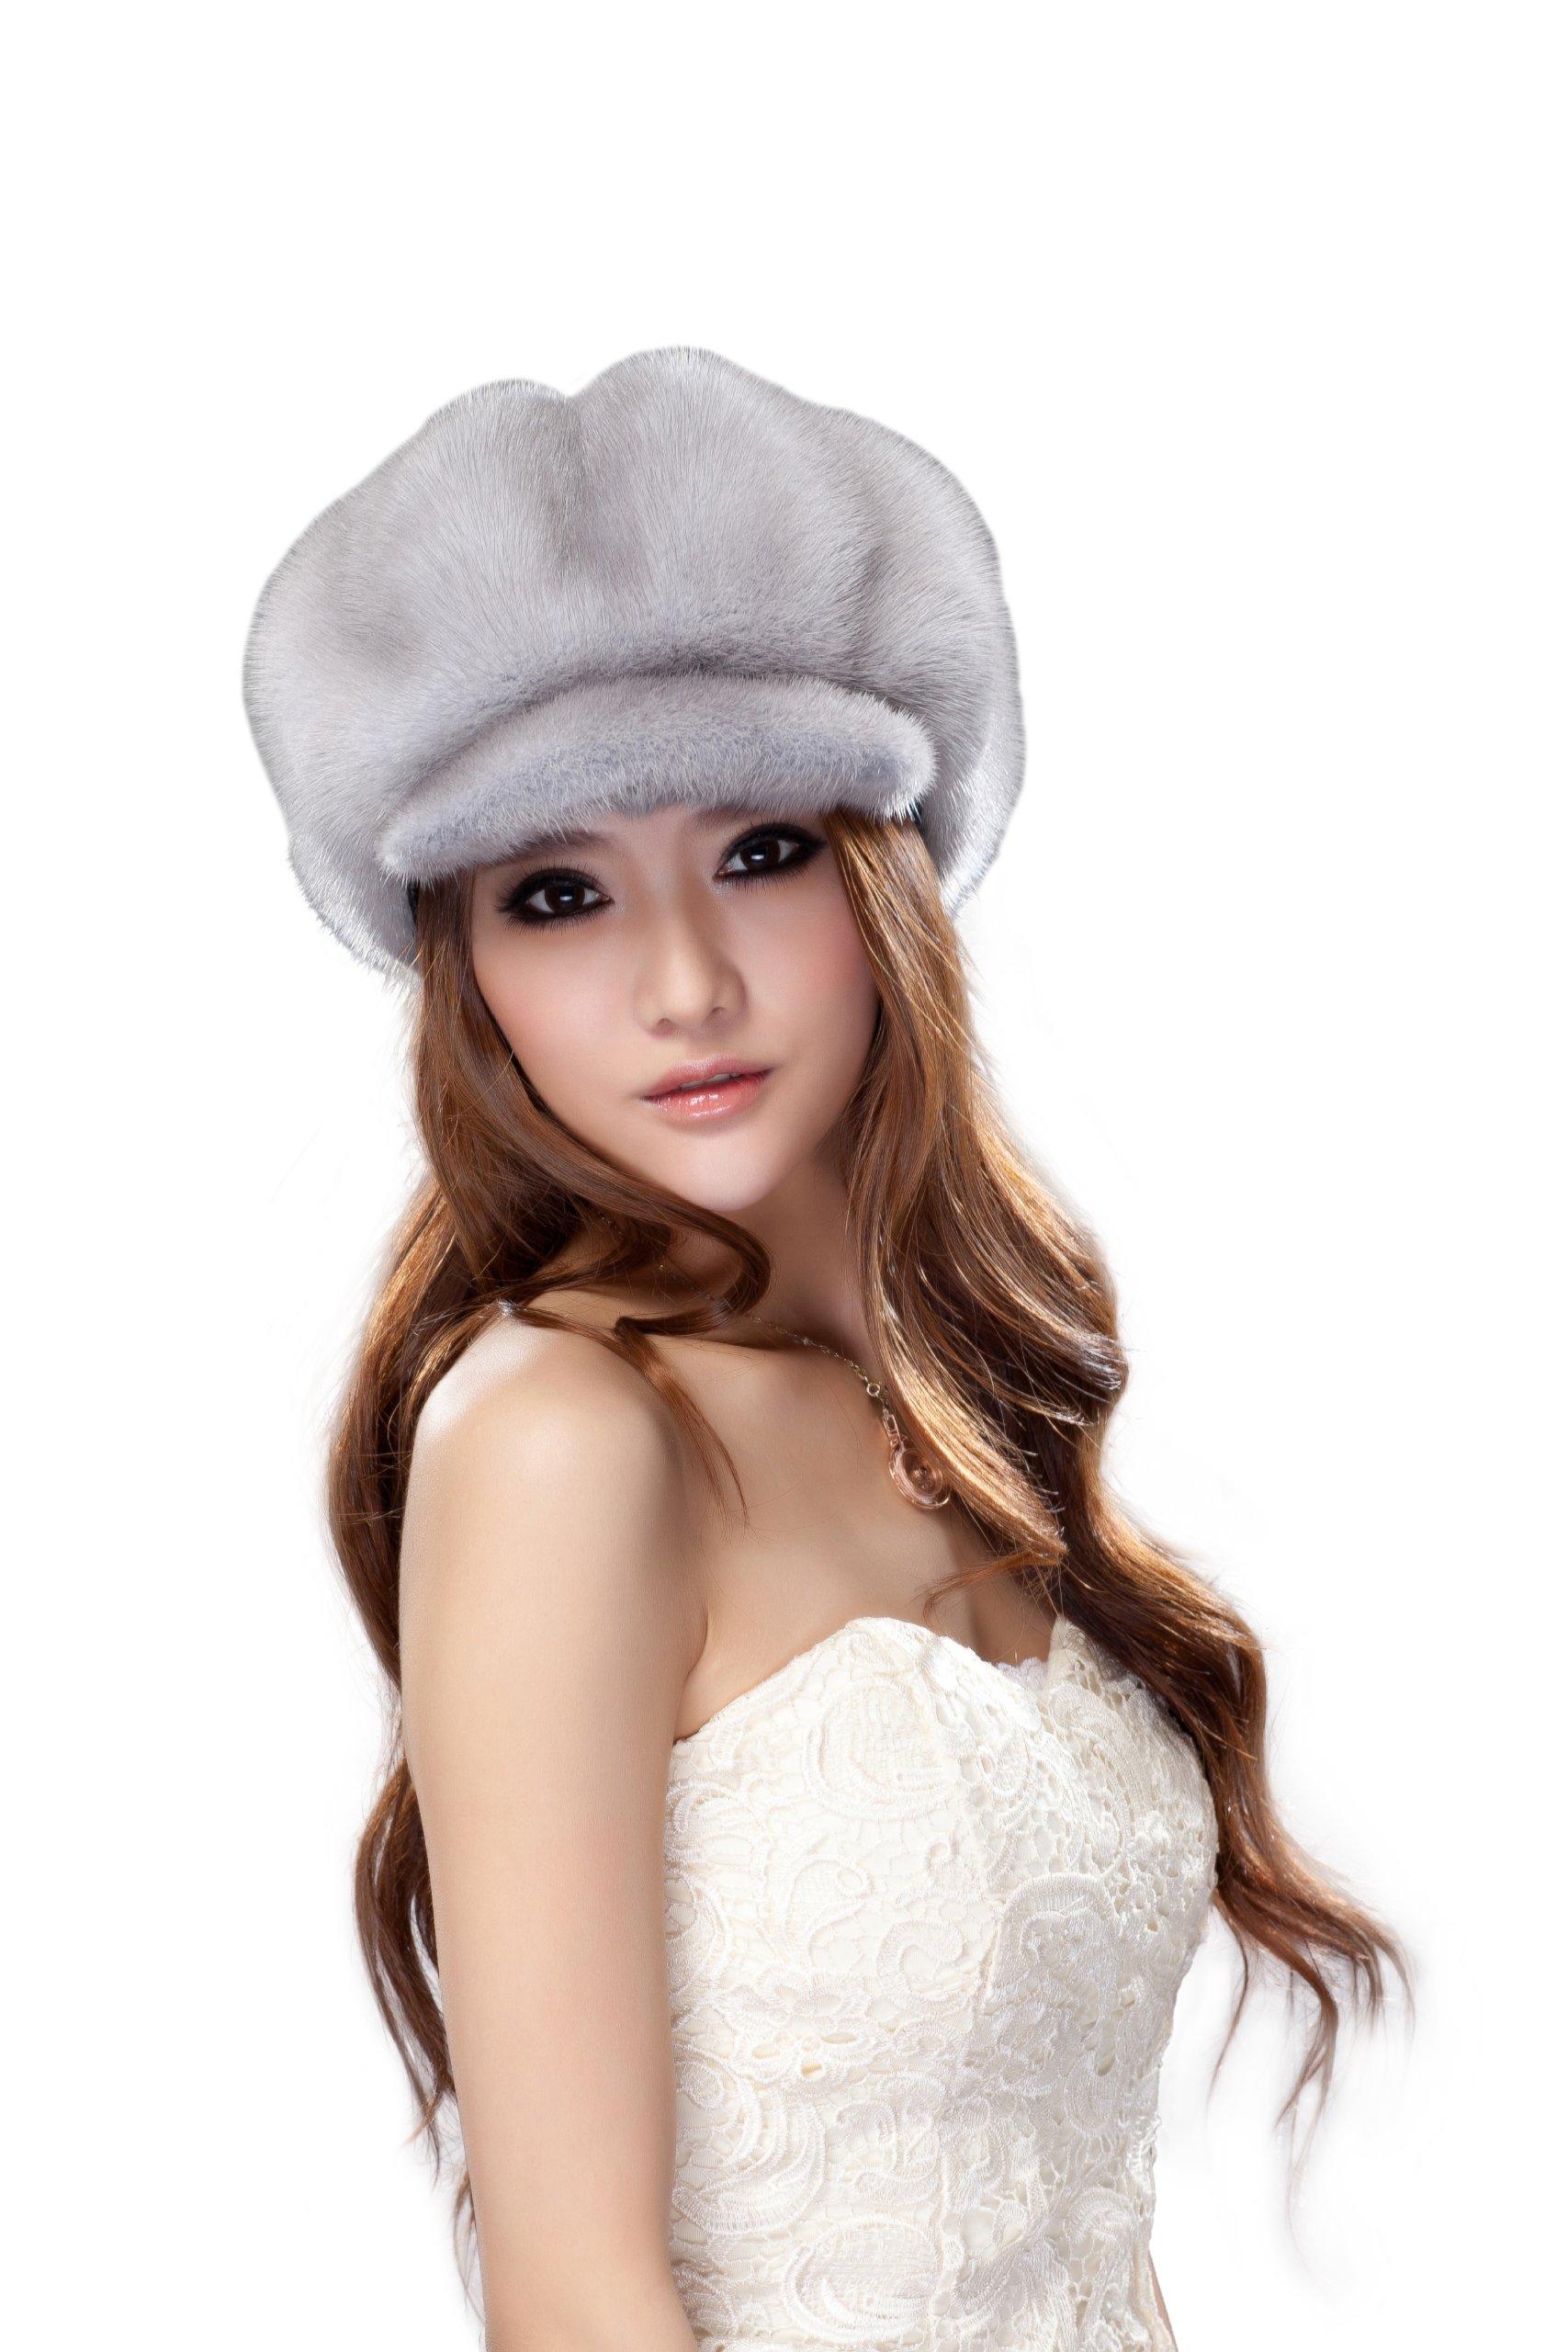 URSFUR Women's Mink Fur Newsboy Cap Hunting Cap Hats (Sapphire)